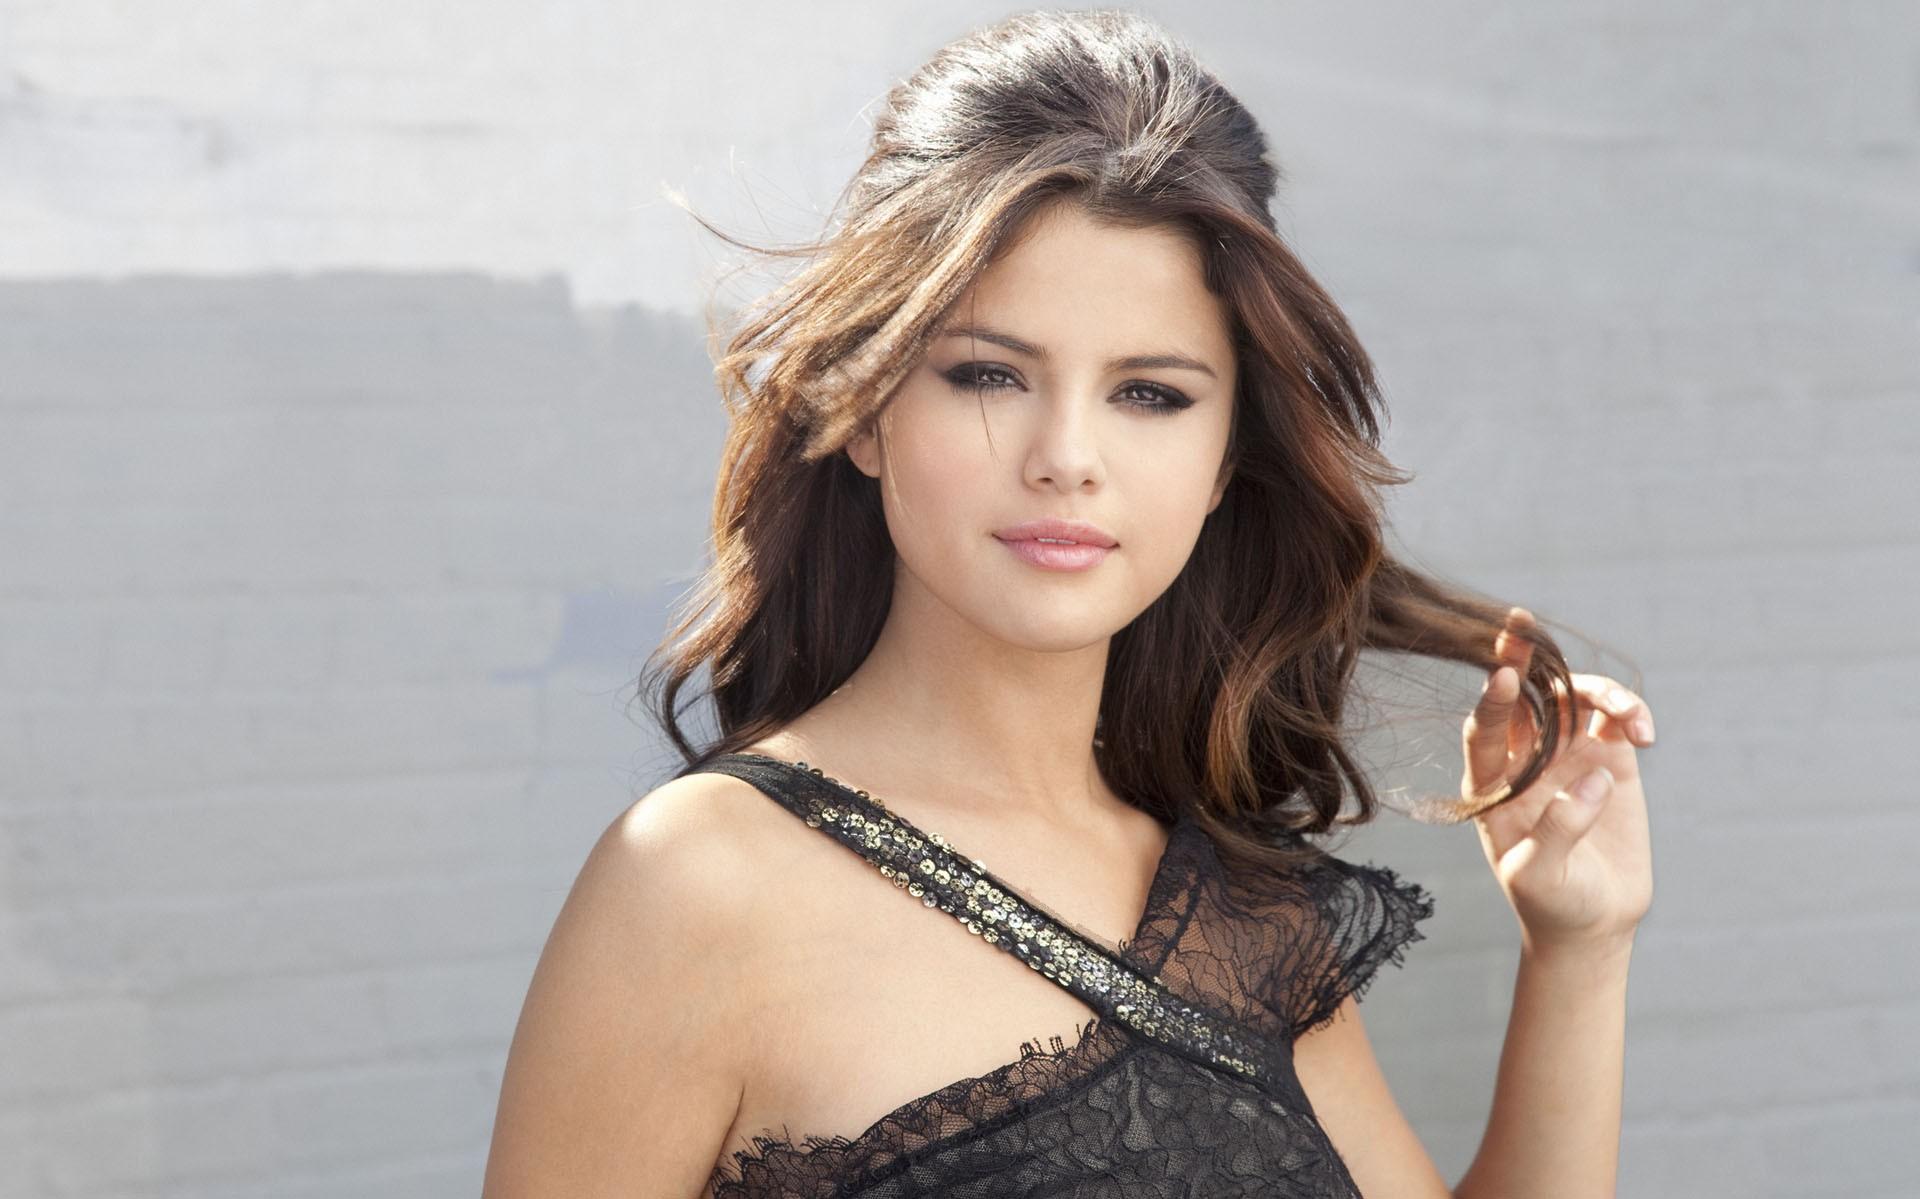 Selena Gomez Wallpaper in high resolution for Get Hot Hd Selena 1920x1199